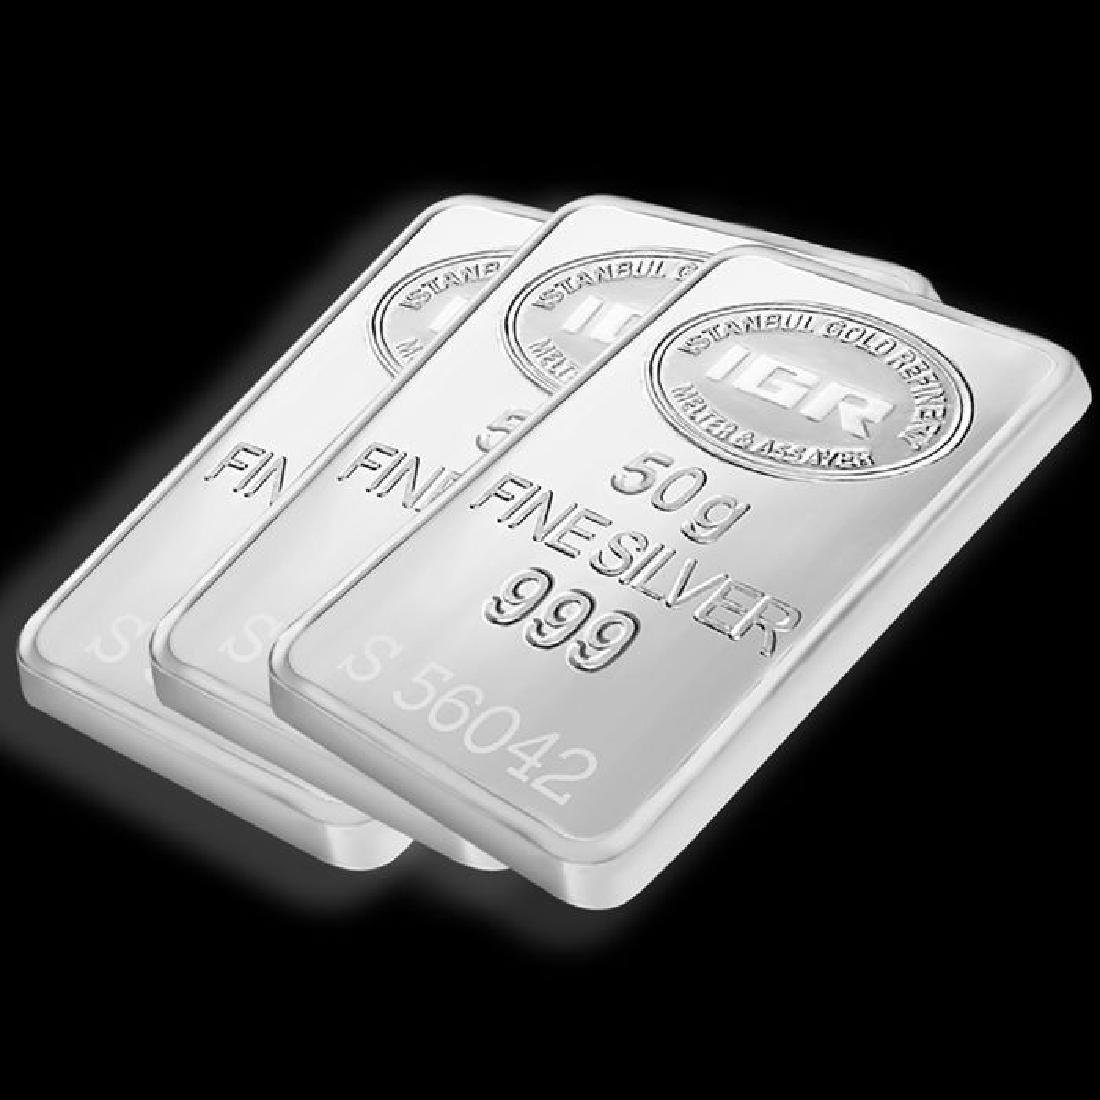 3 x 50 gr. - 999/1000 - Minted/ Sealed Silver Bar - 4